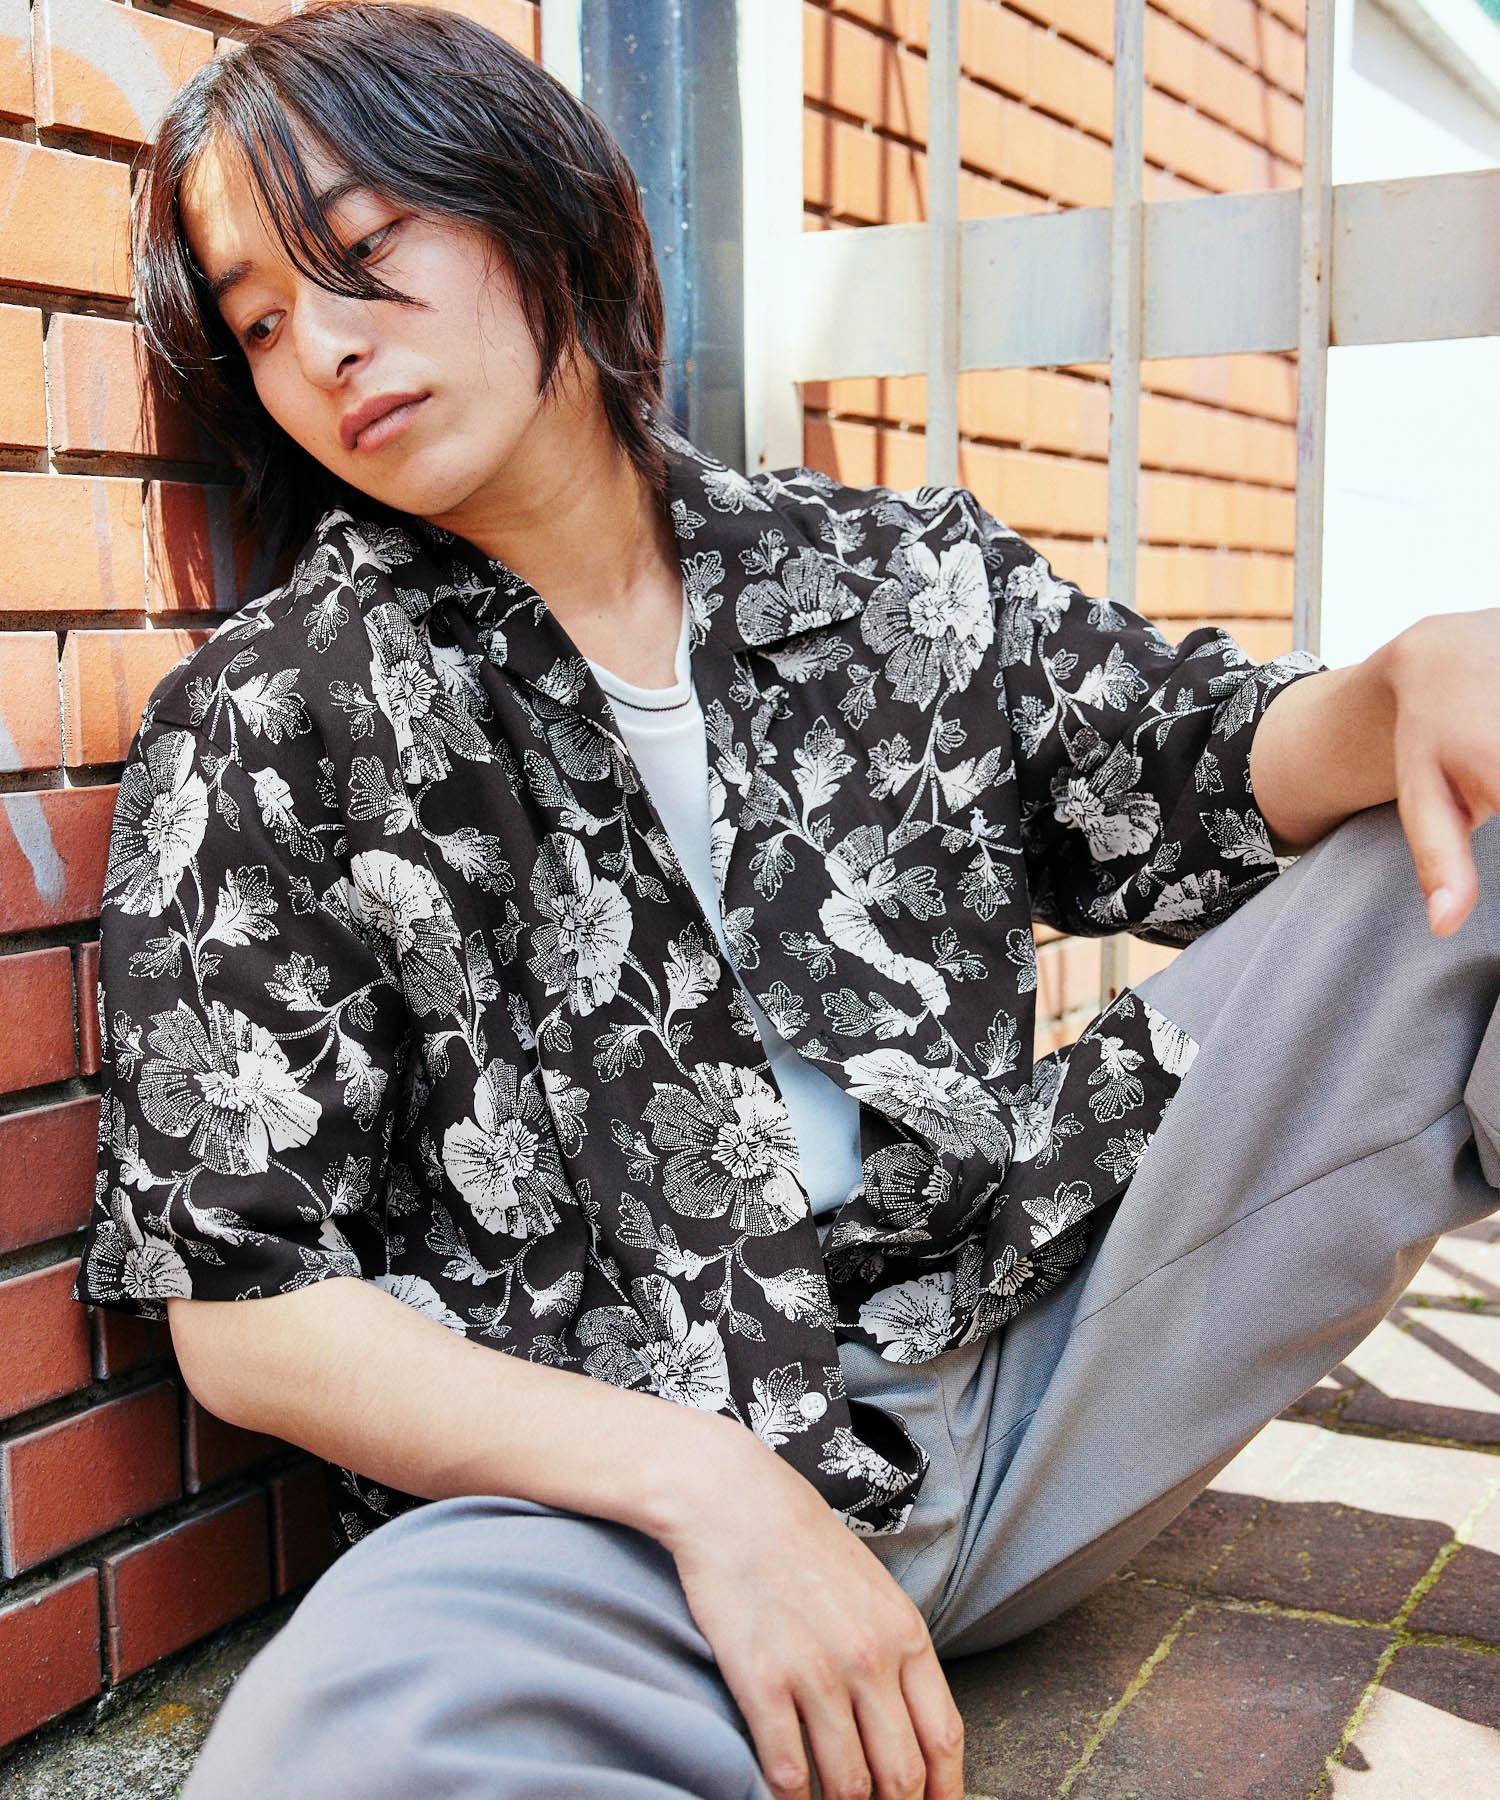 KANGOL/カンゴール 別注 ロゴ刺繍 ビッグシルエット 柄シャツ 総柄 オープンカラーシャツ アロハシャツ 2021SUMMER